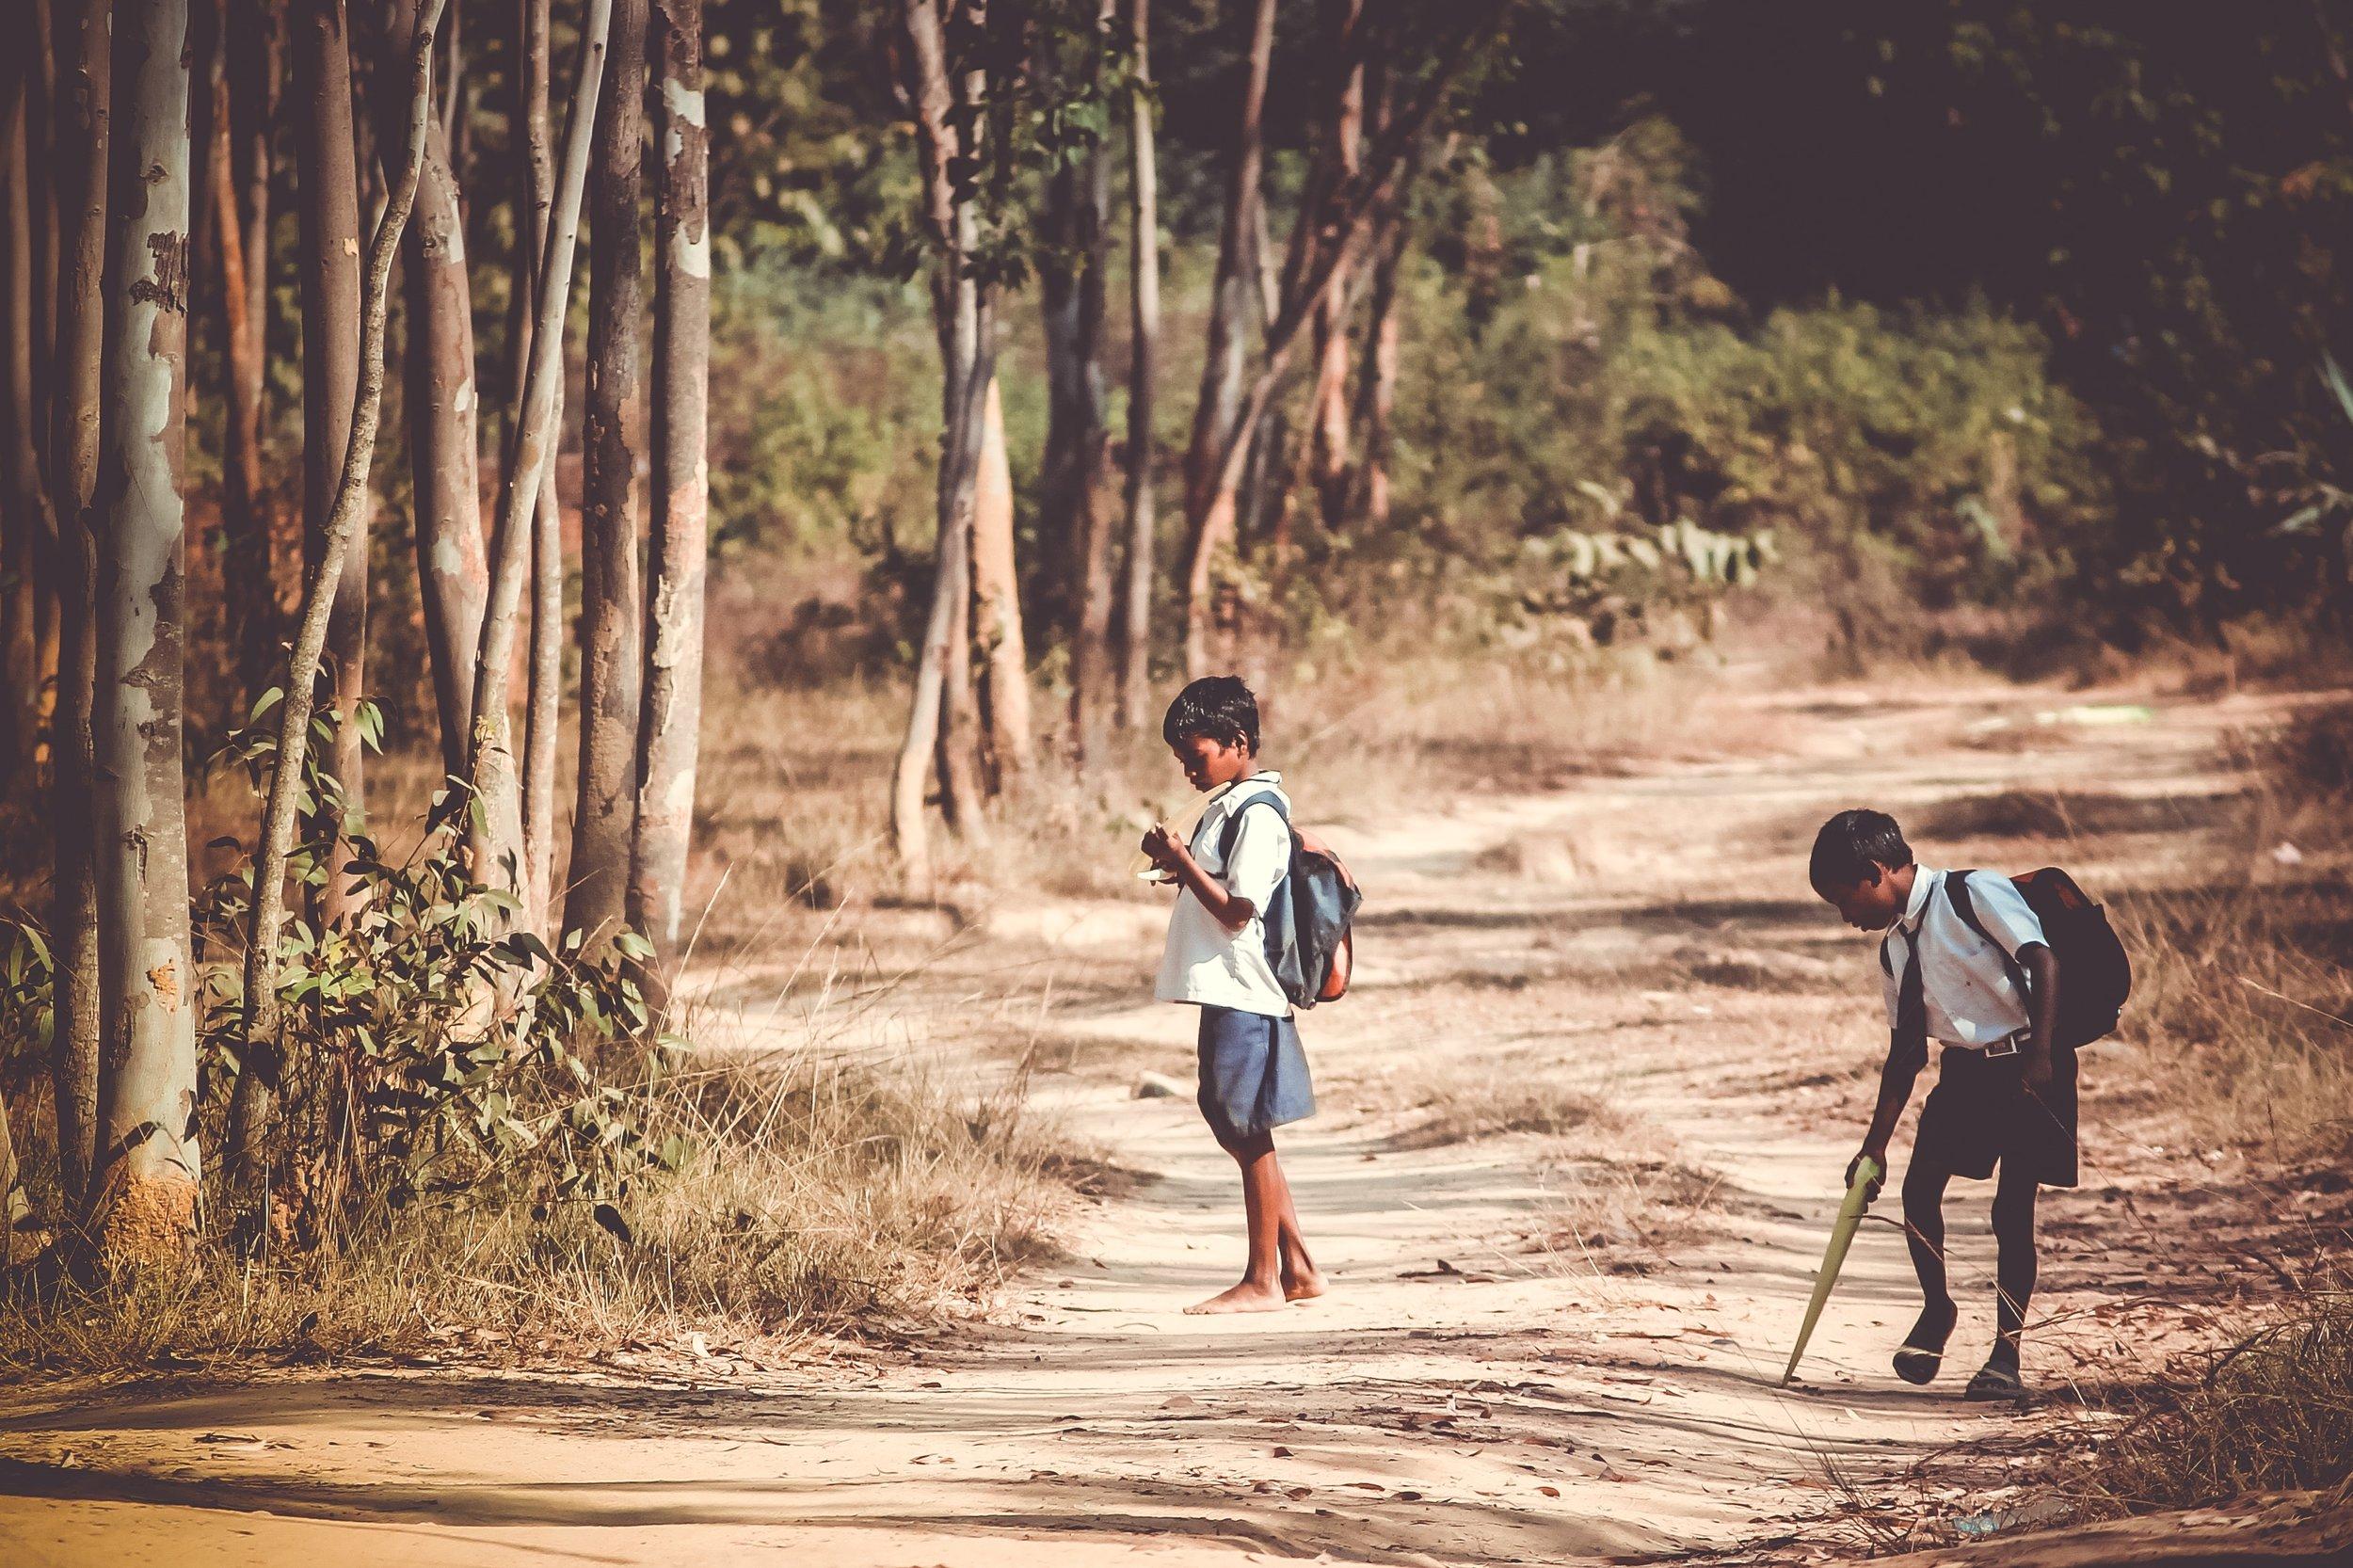 Photo by  Himesh Kumar Behera  on  Unsplash